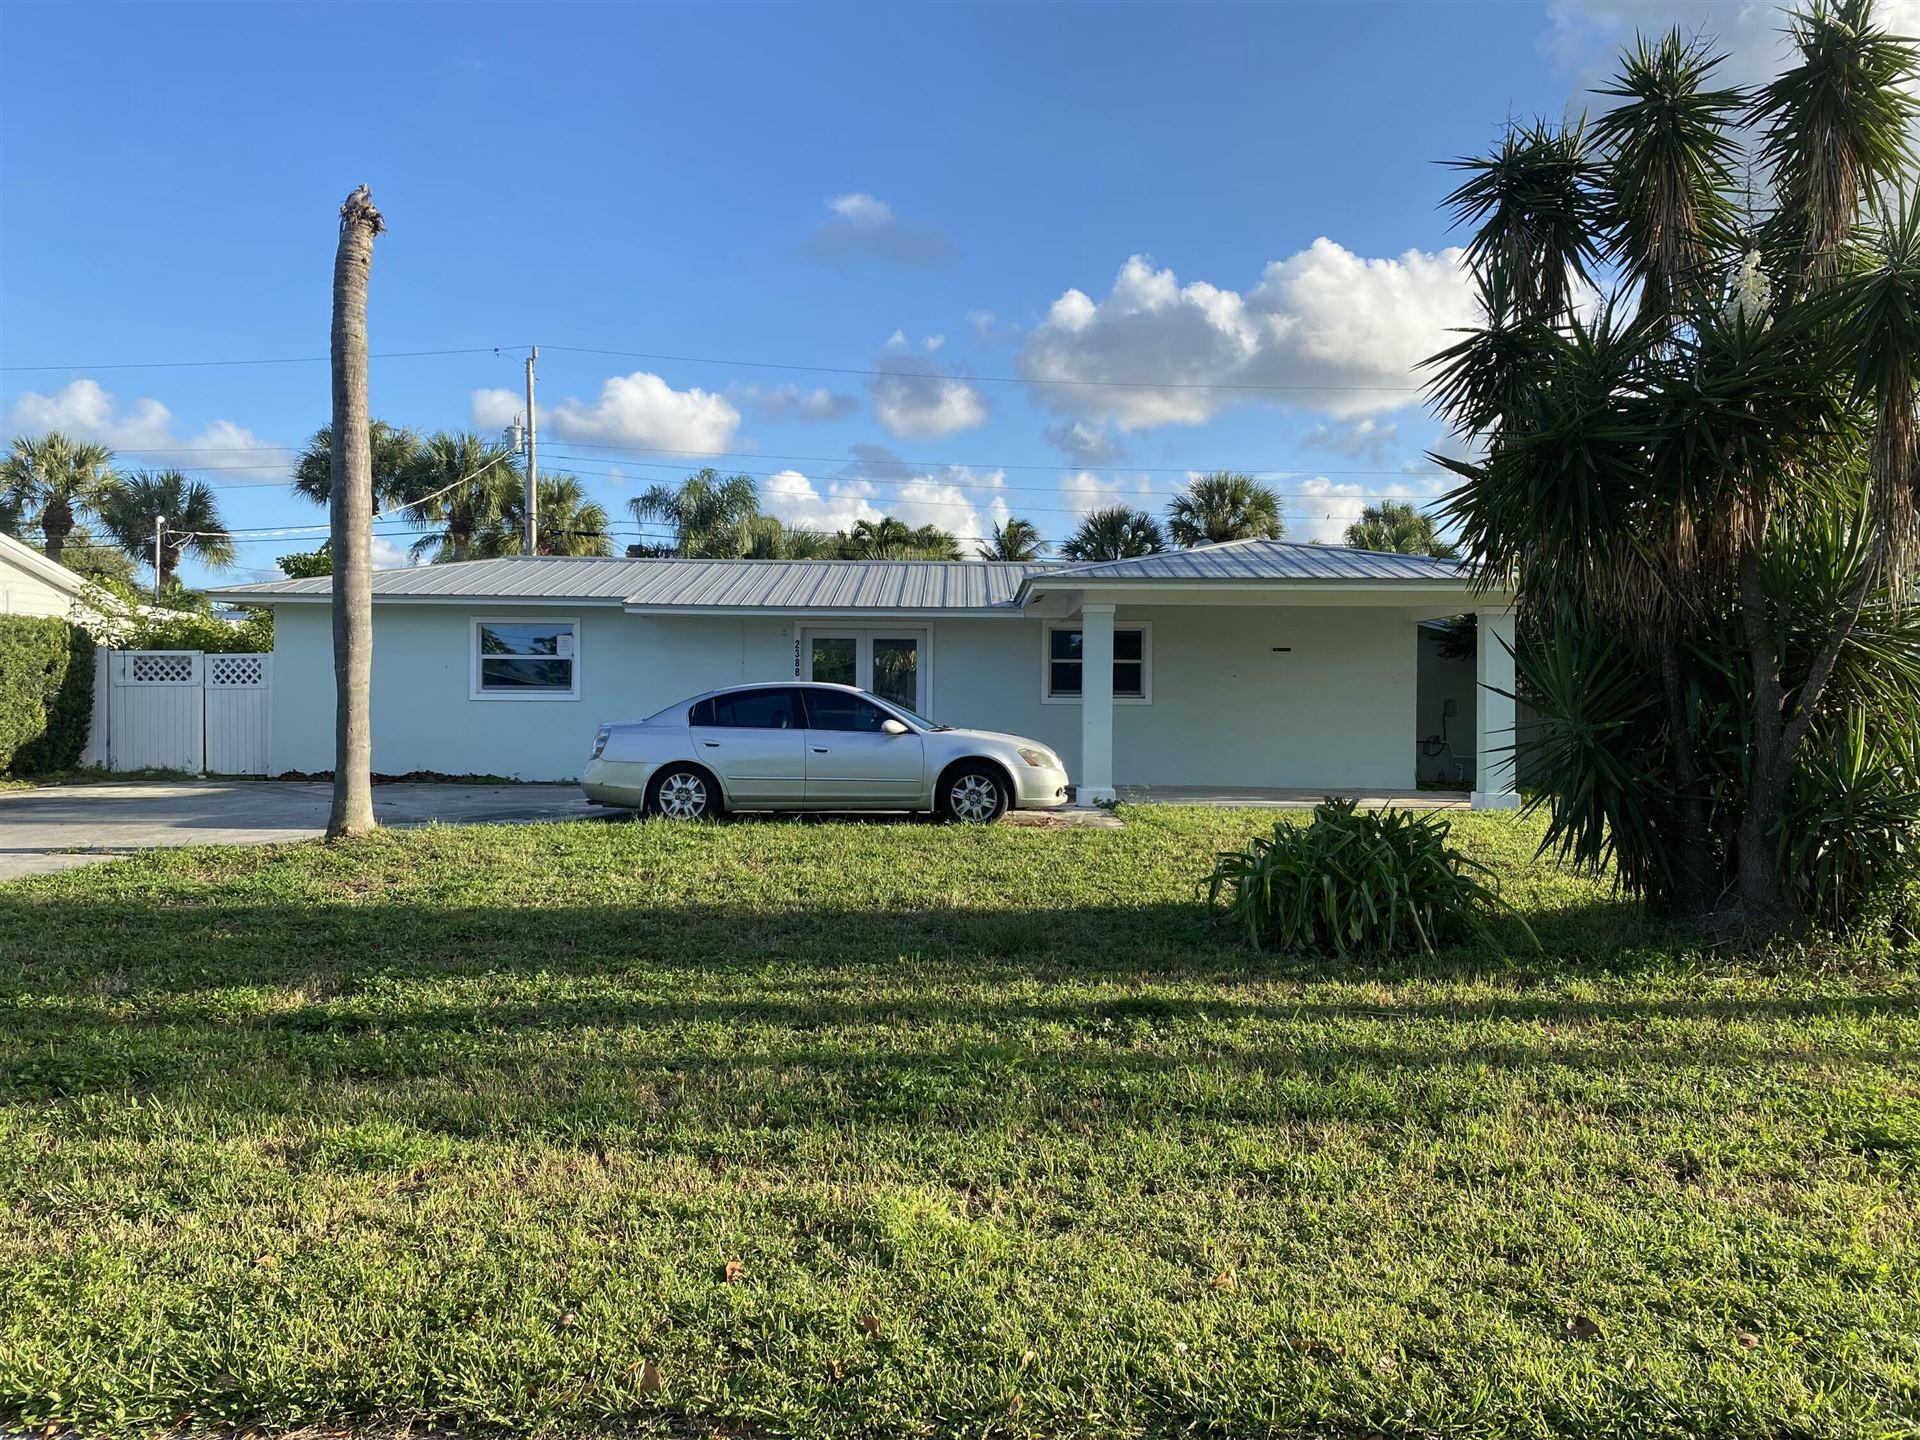 2388 S Wallen Drive, West Palm Beach, FL 33410 - MLS#: RX-10746069